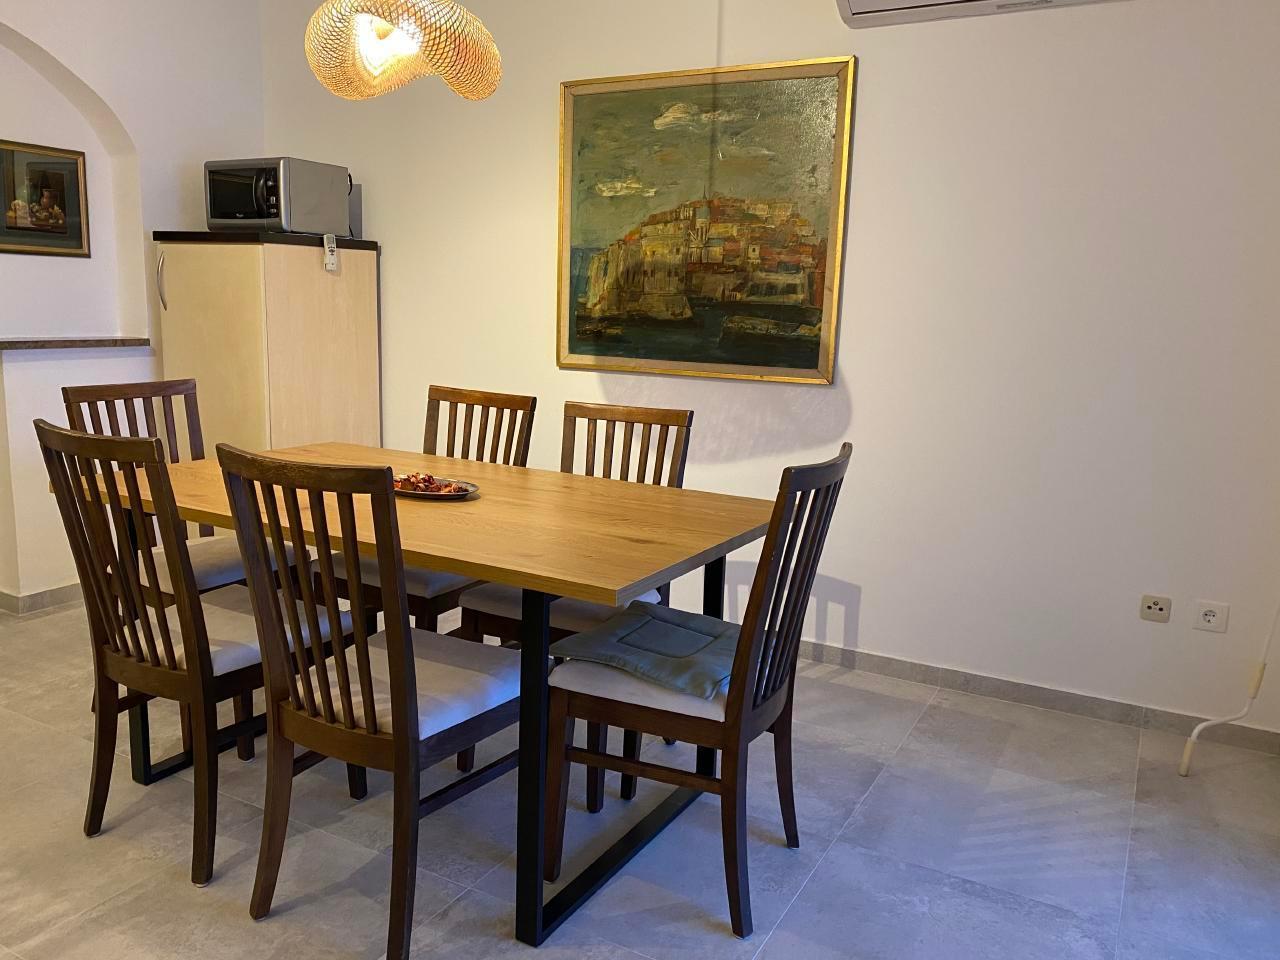 Ferienwohnung Casa Anica Apartment Bellevue (656993), Kuciste, Insel Peljesac, Dalmatien, Kroatien, Bild 8